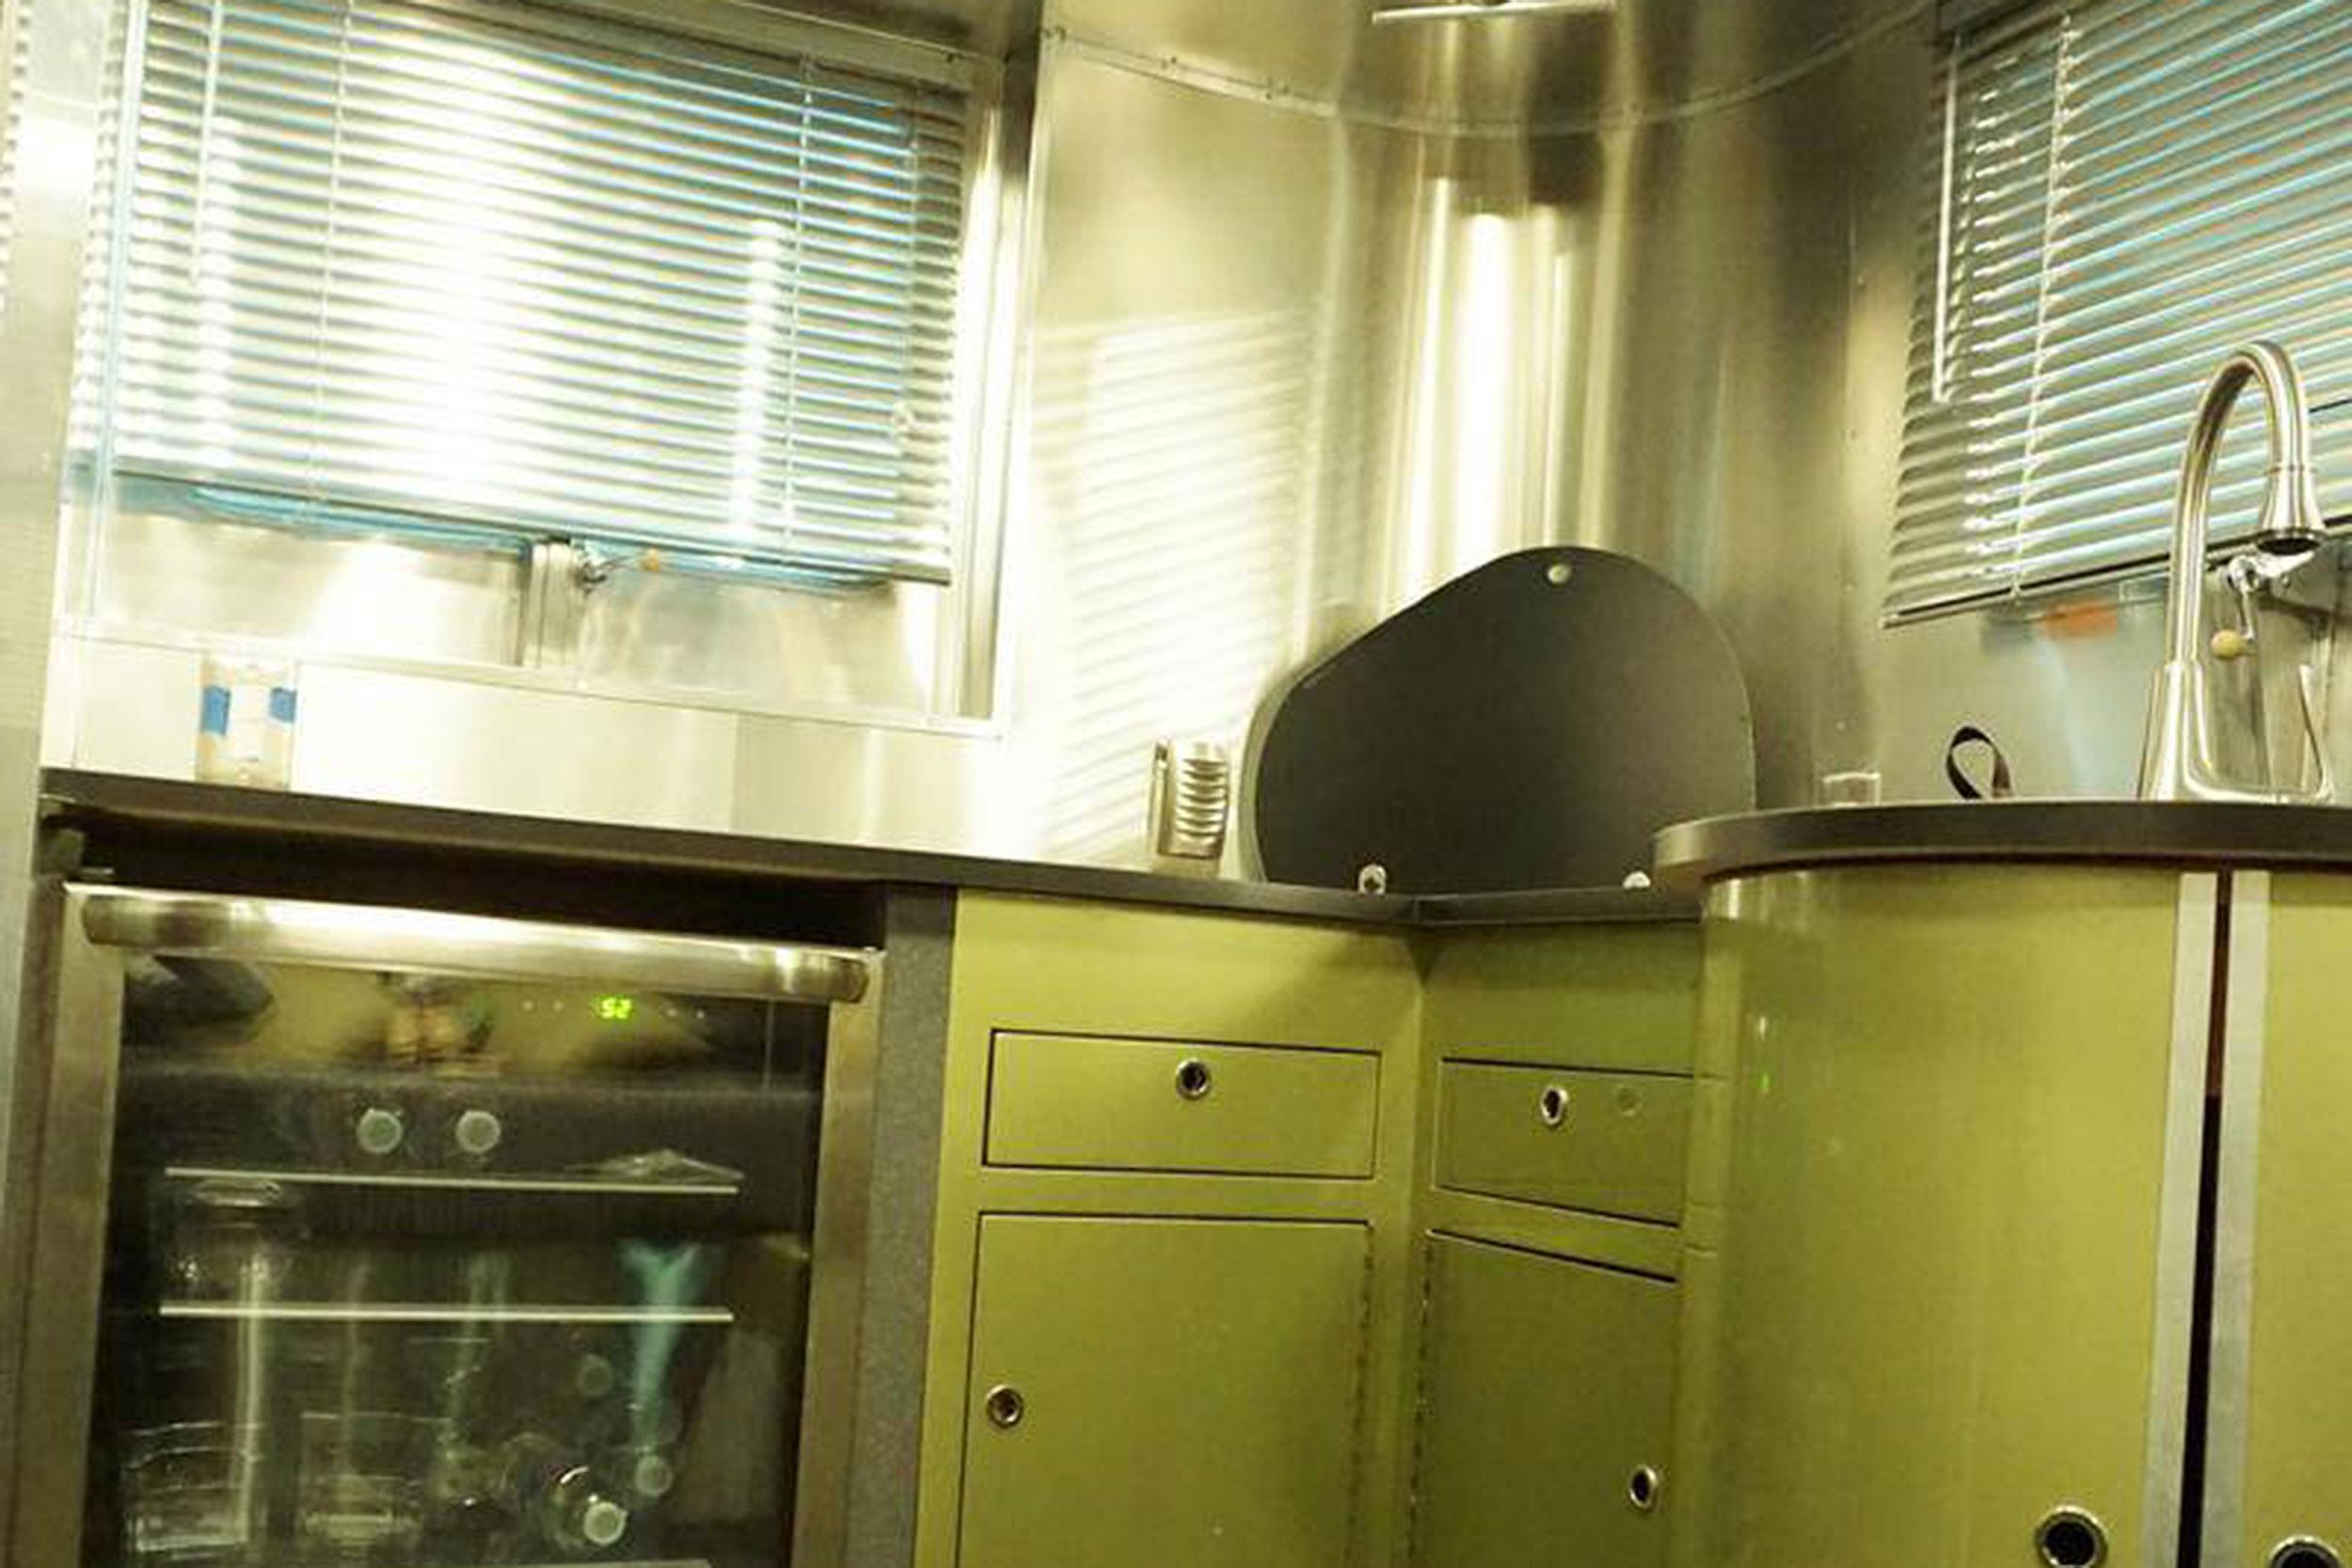 1952 Chevrolet Suburban trailer kitchen